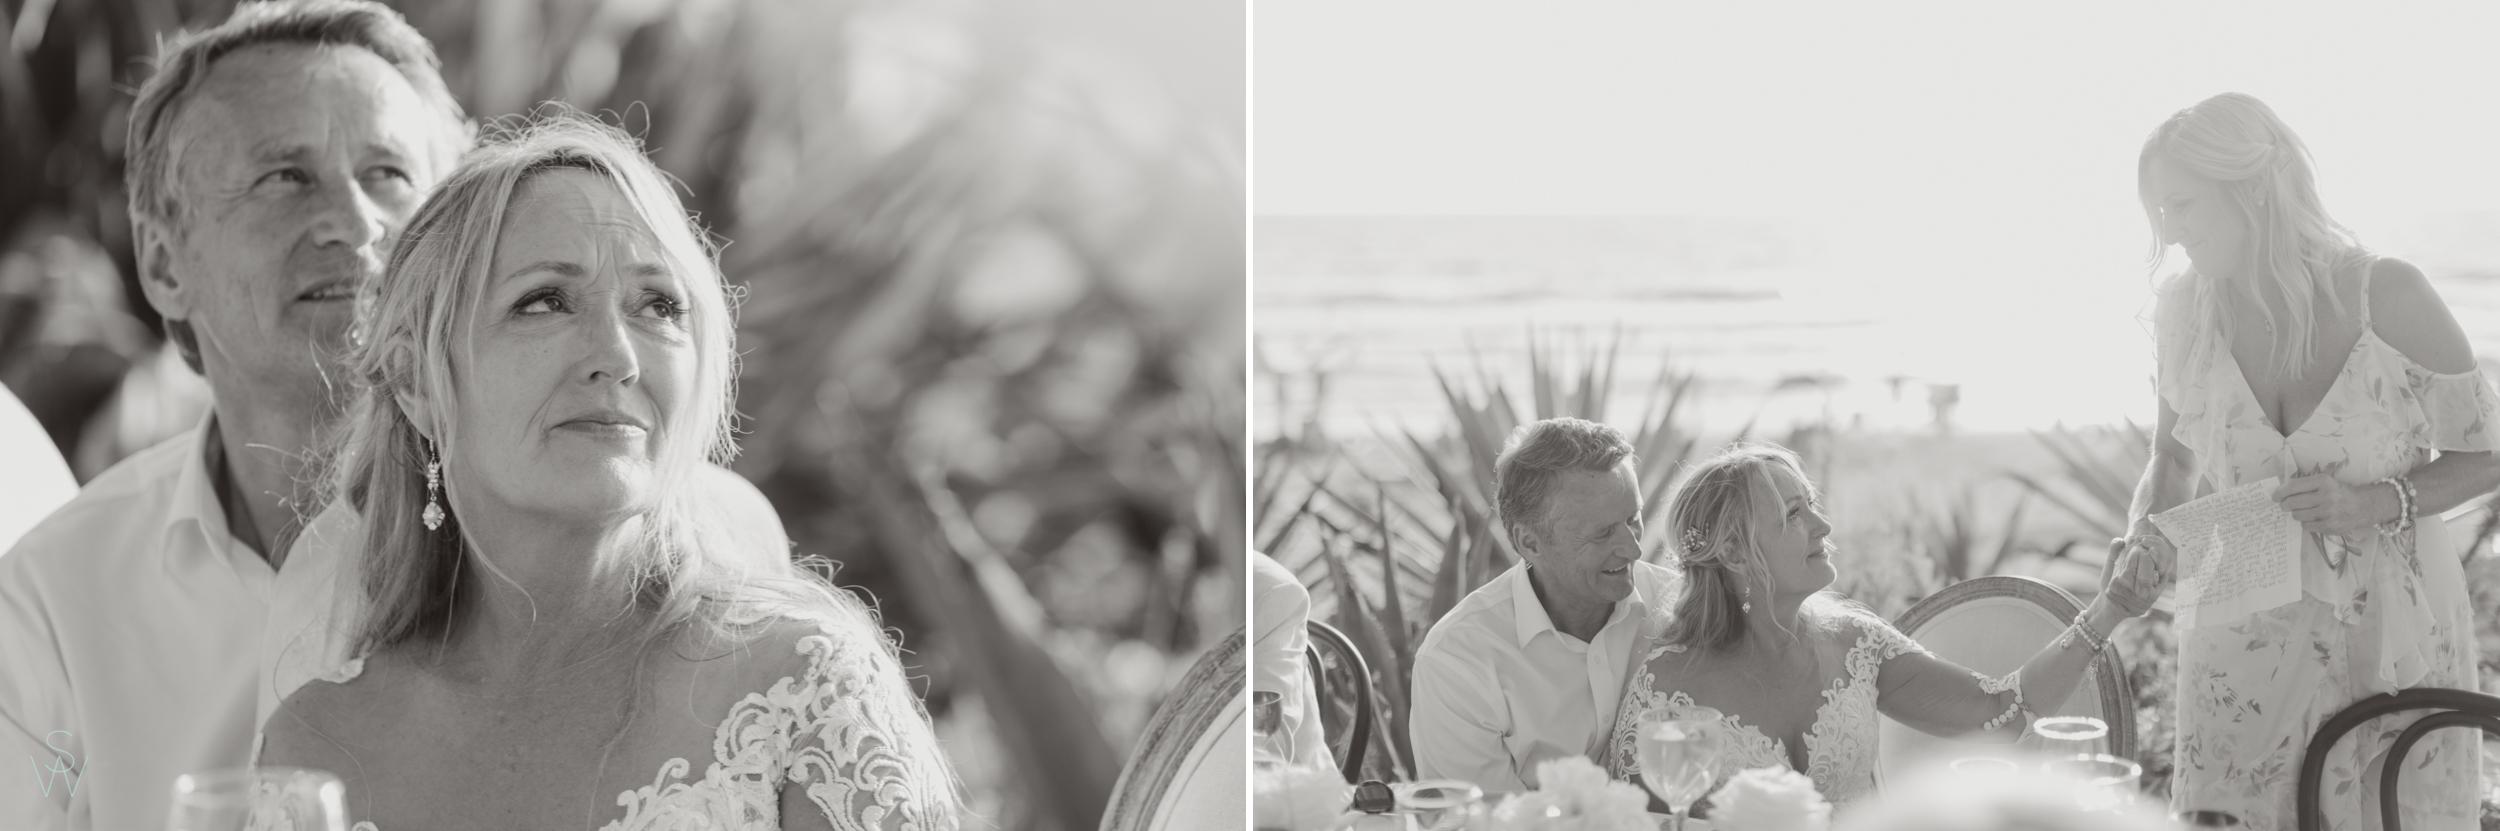 150DEL.MAR.WEDDINGS.photography.shewanders.JPG